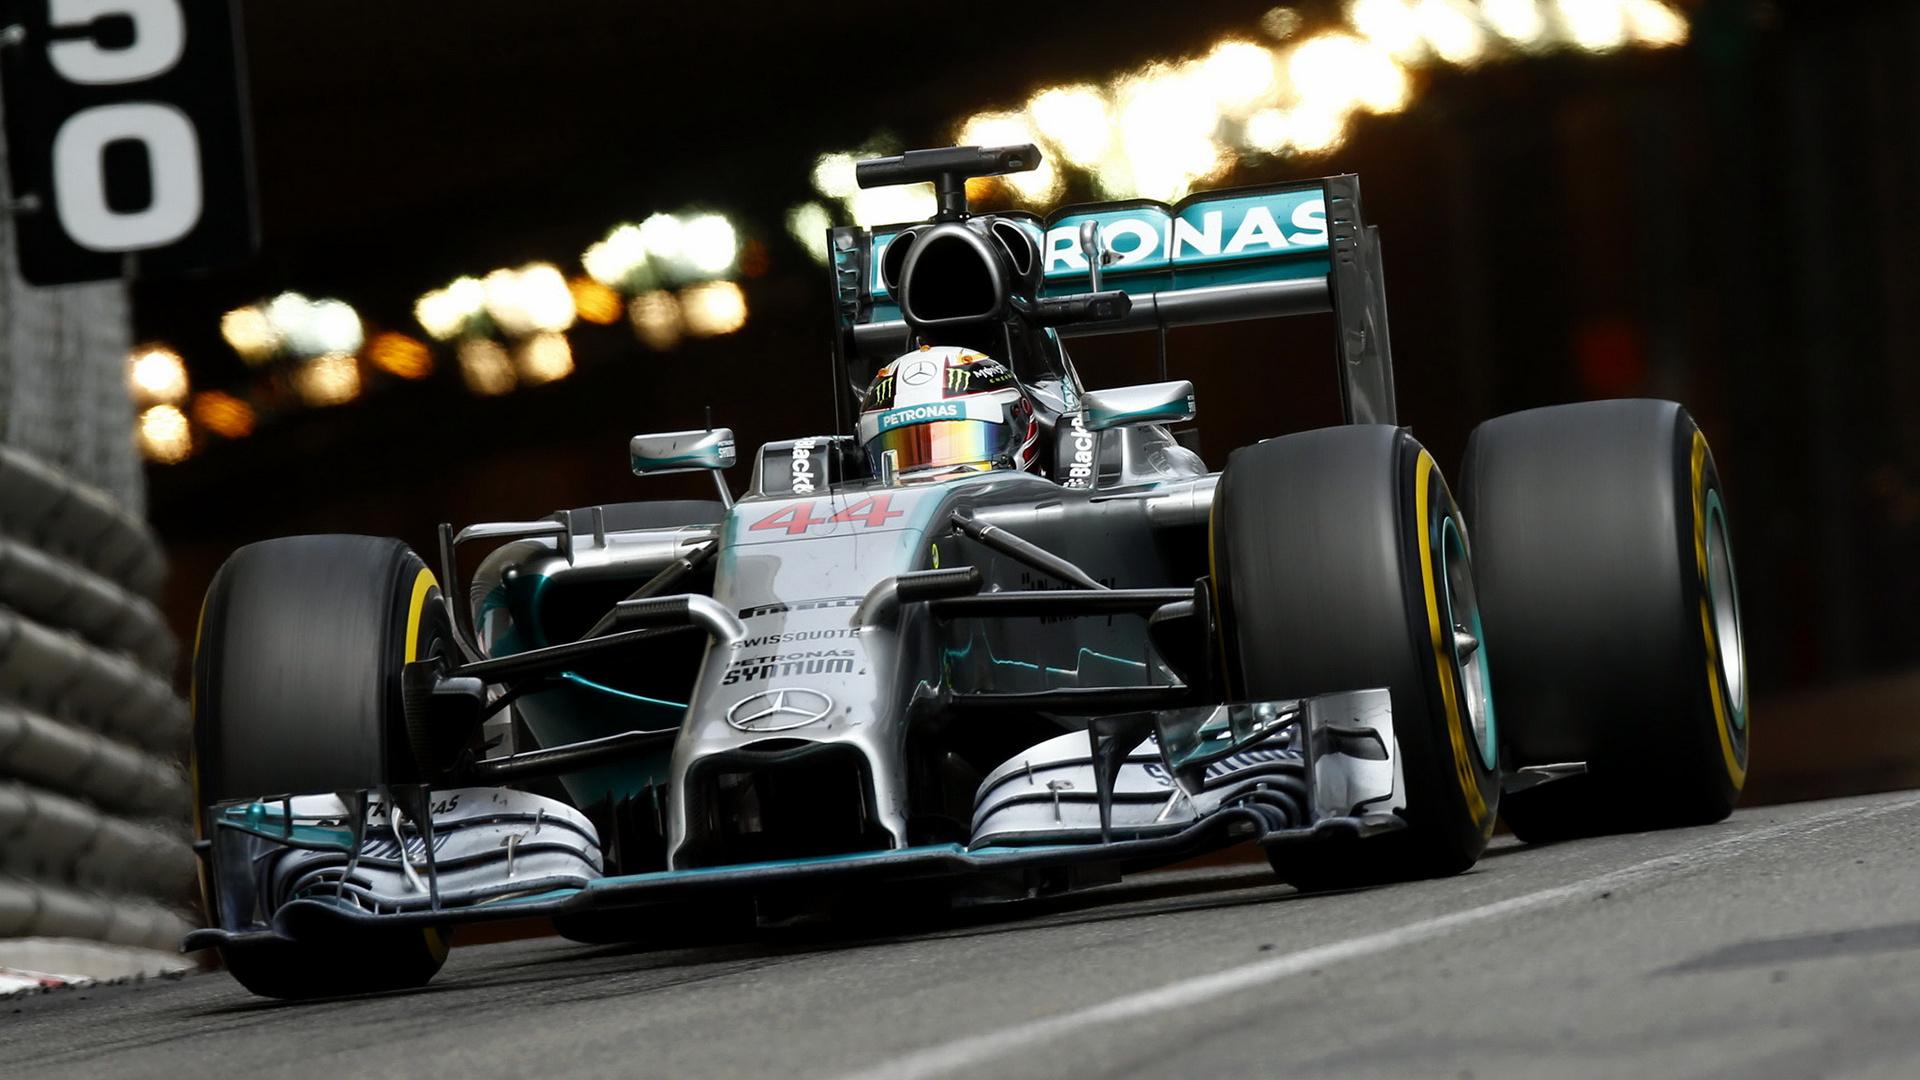 Mercedes Amg Petronas F1 Hd Hintergrundbilder 4k: Mercedes AMG Petronas Wallpaper